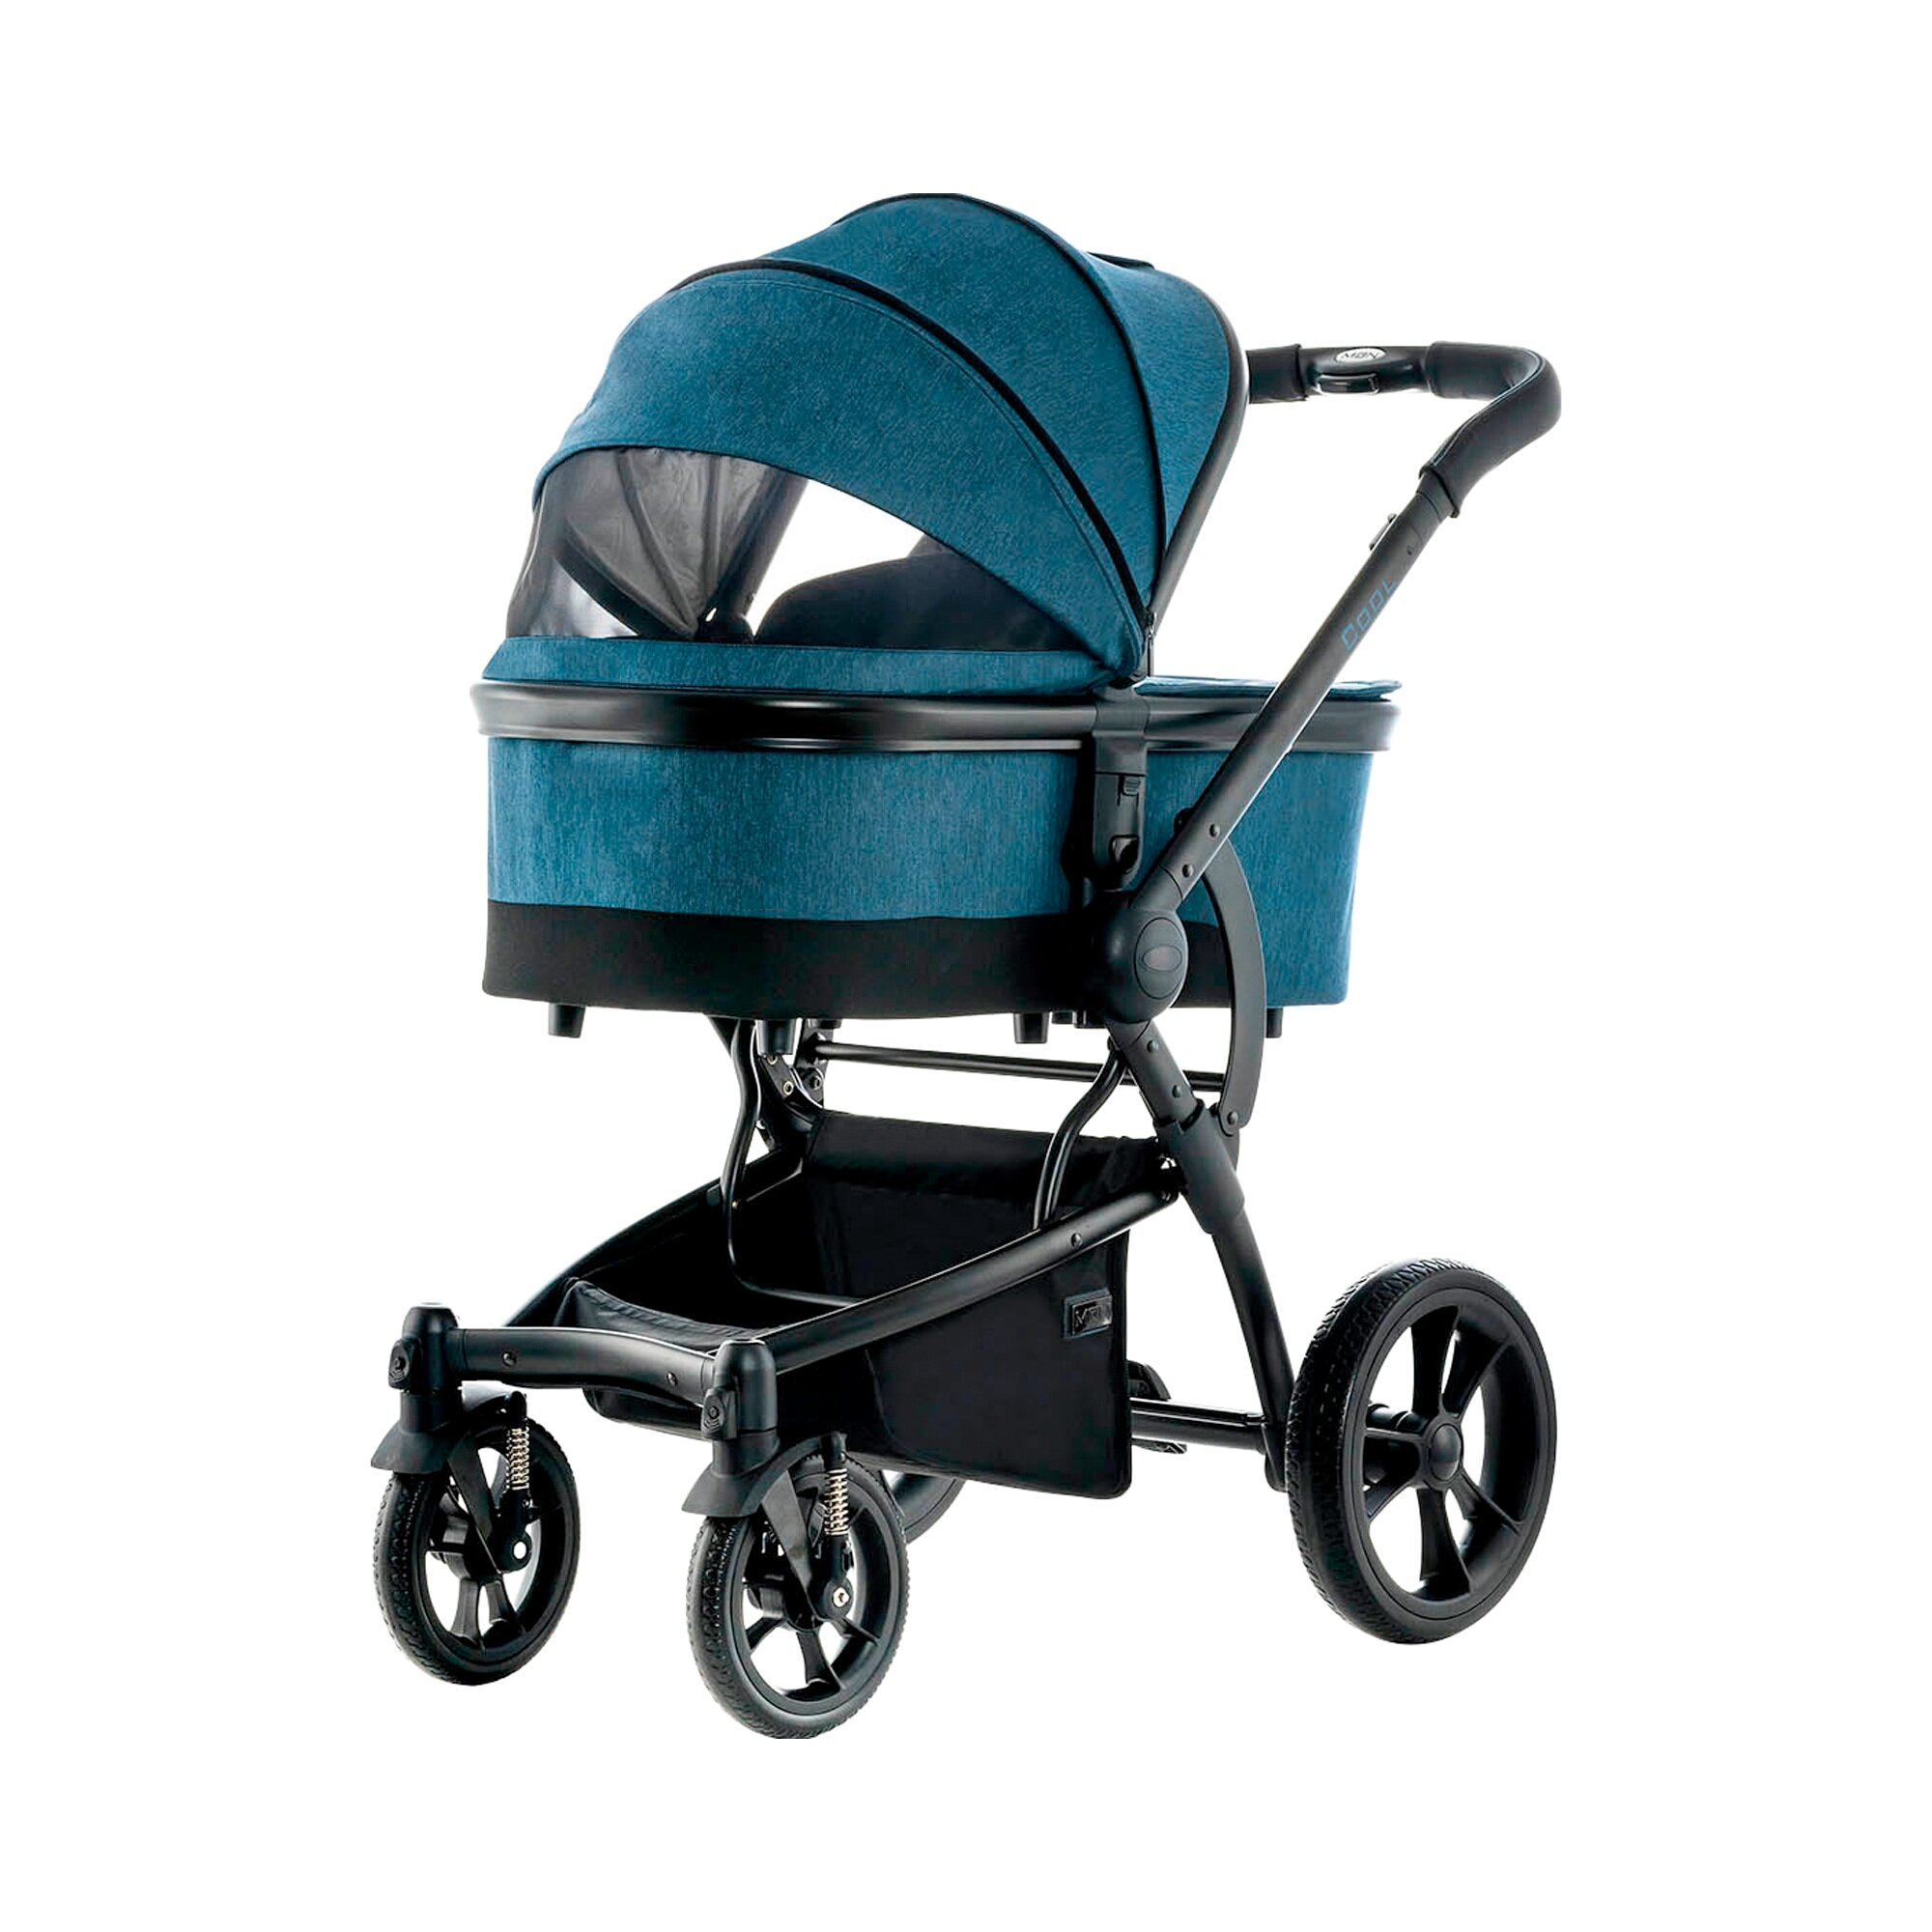 moon-kombikinderwagen-cool-design-2018-blau